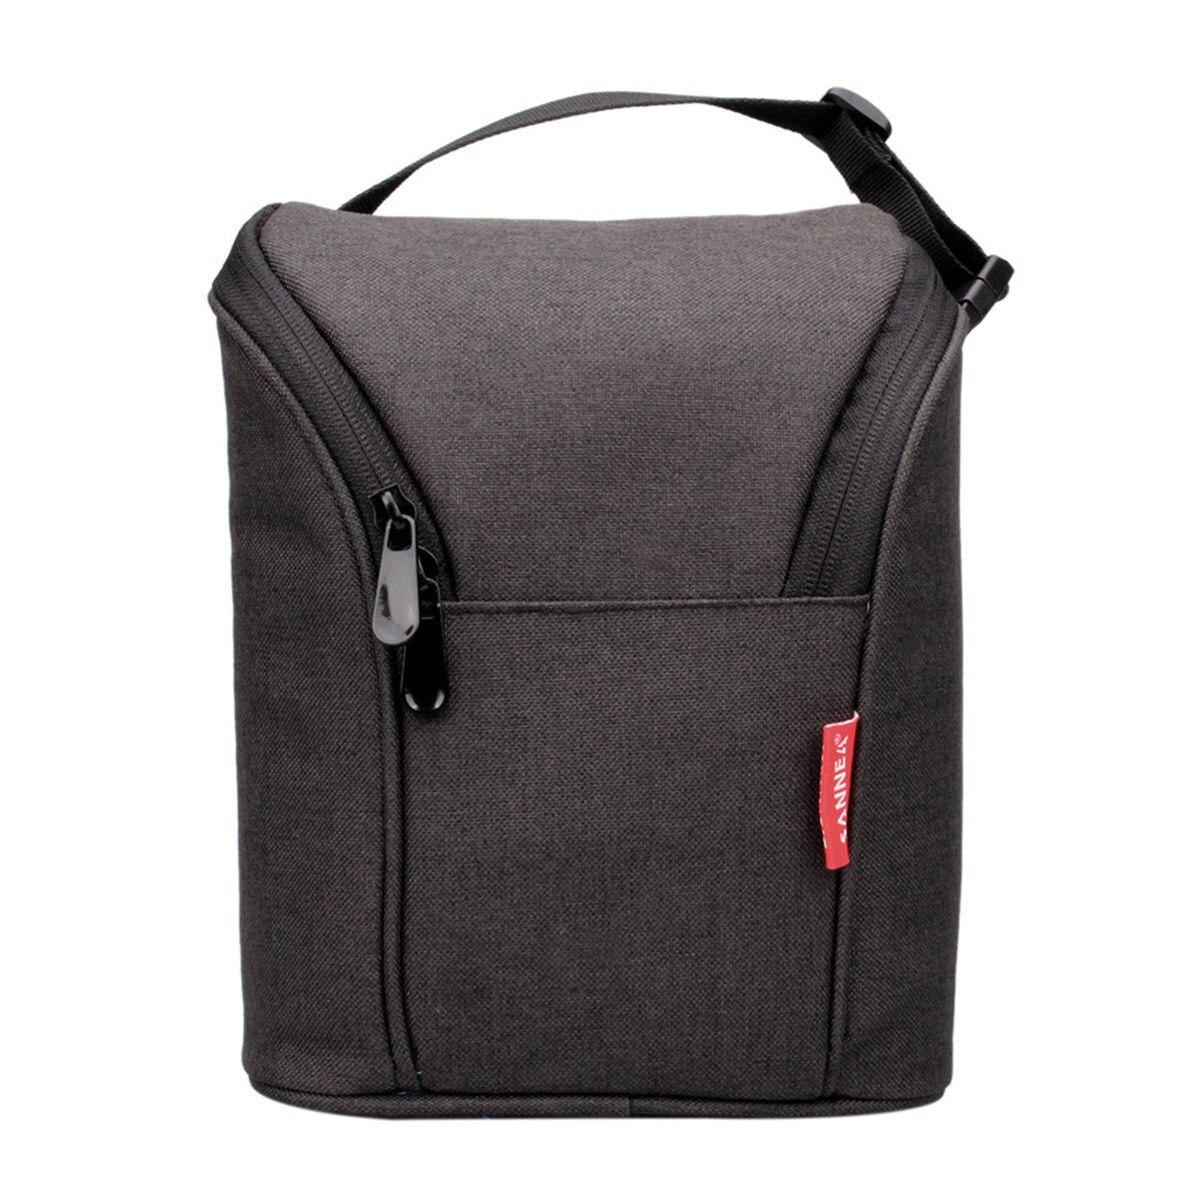 Bolsa de 4L para lonchera, bolsa con aislamiento térmico para viaje, Picnic escolar 17*23*9cm negro/gris/rojo vino portátil